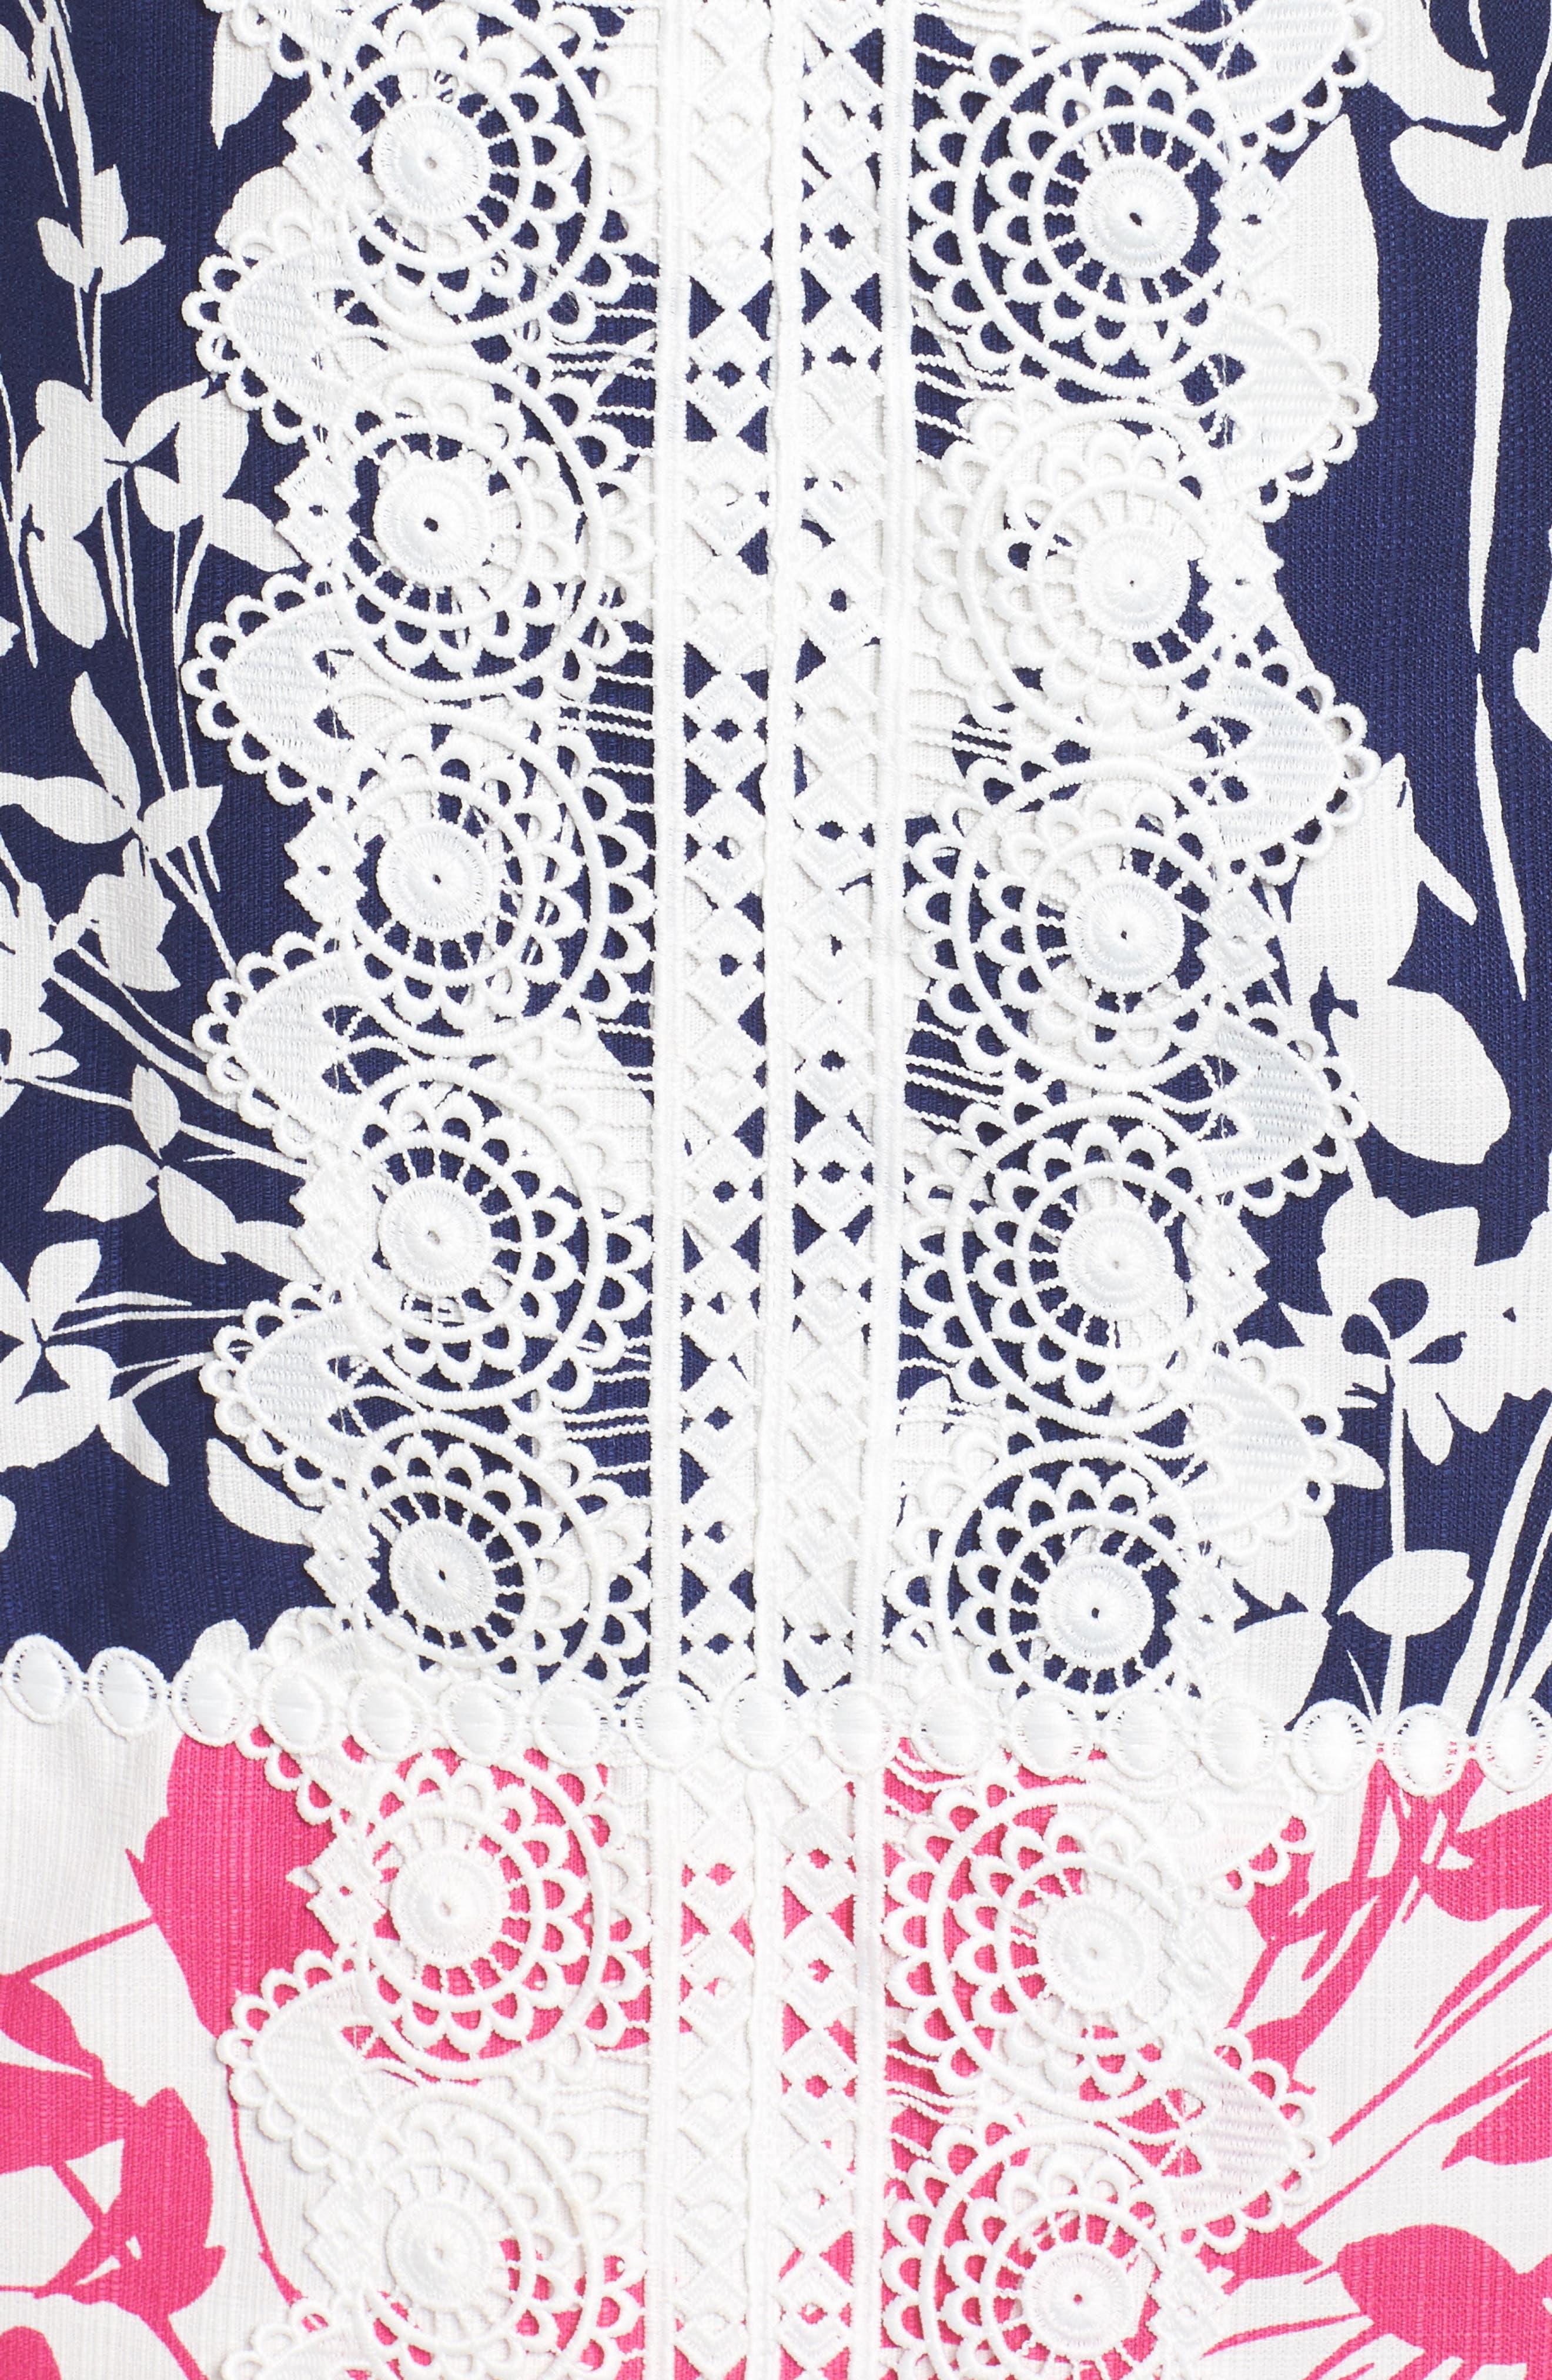 Lace Trim Two Tone Print Shift Dress,                             Alternate thumbnail 5, color,                             Navy/ Pink